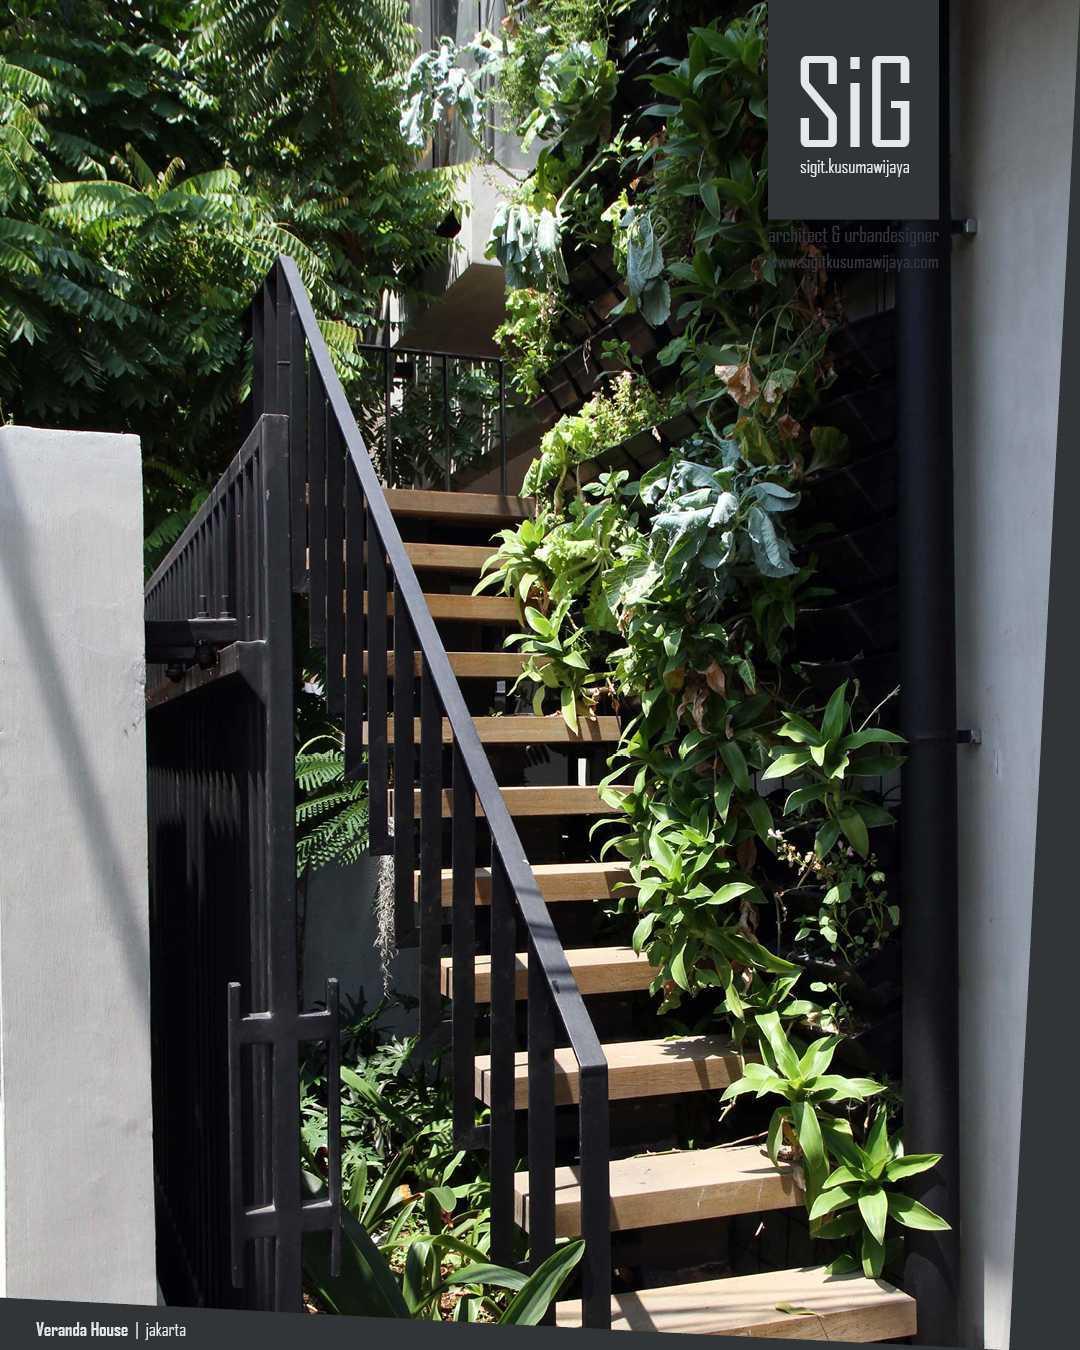 Sigit.kusumawijaya | Architect & Urbandesigner Rumah Beranda - Green Boarding House Cipete, South Jakarta, Indonesia Cipete, South Jakarta, Indonesia Sigitkusumawijaya-Architect-Urbandesigner-Rumah-Beranda-Green-Boarding-House Industrial 55008